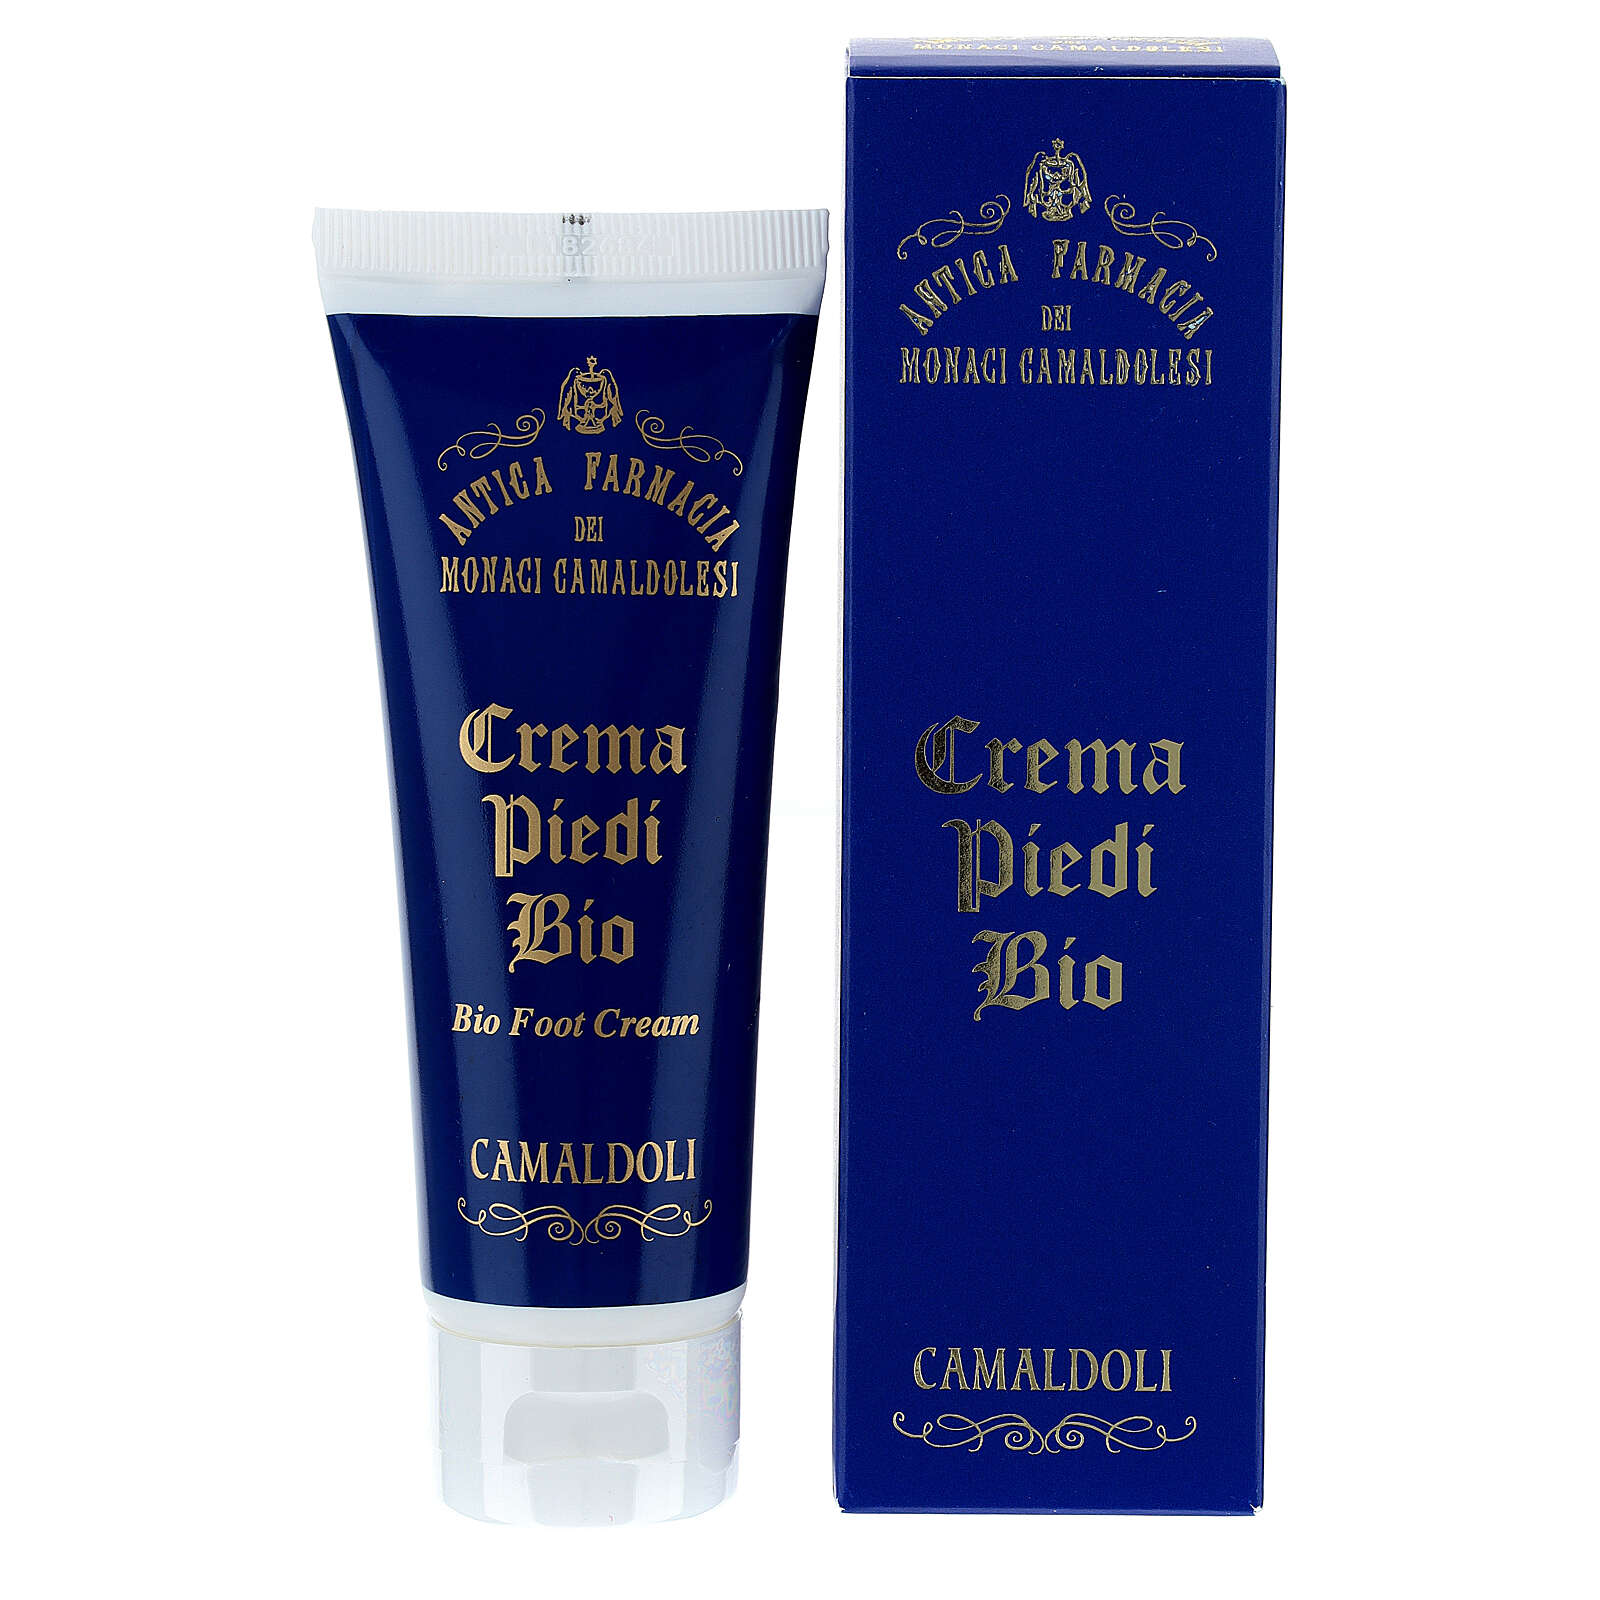 Crema Piedi rinfrescante Bio BDIH 75 ml Camaldoli 4